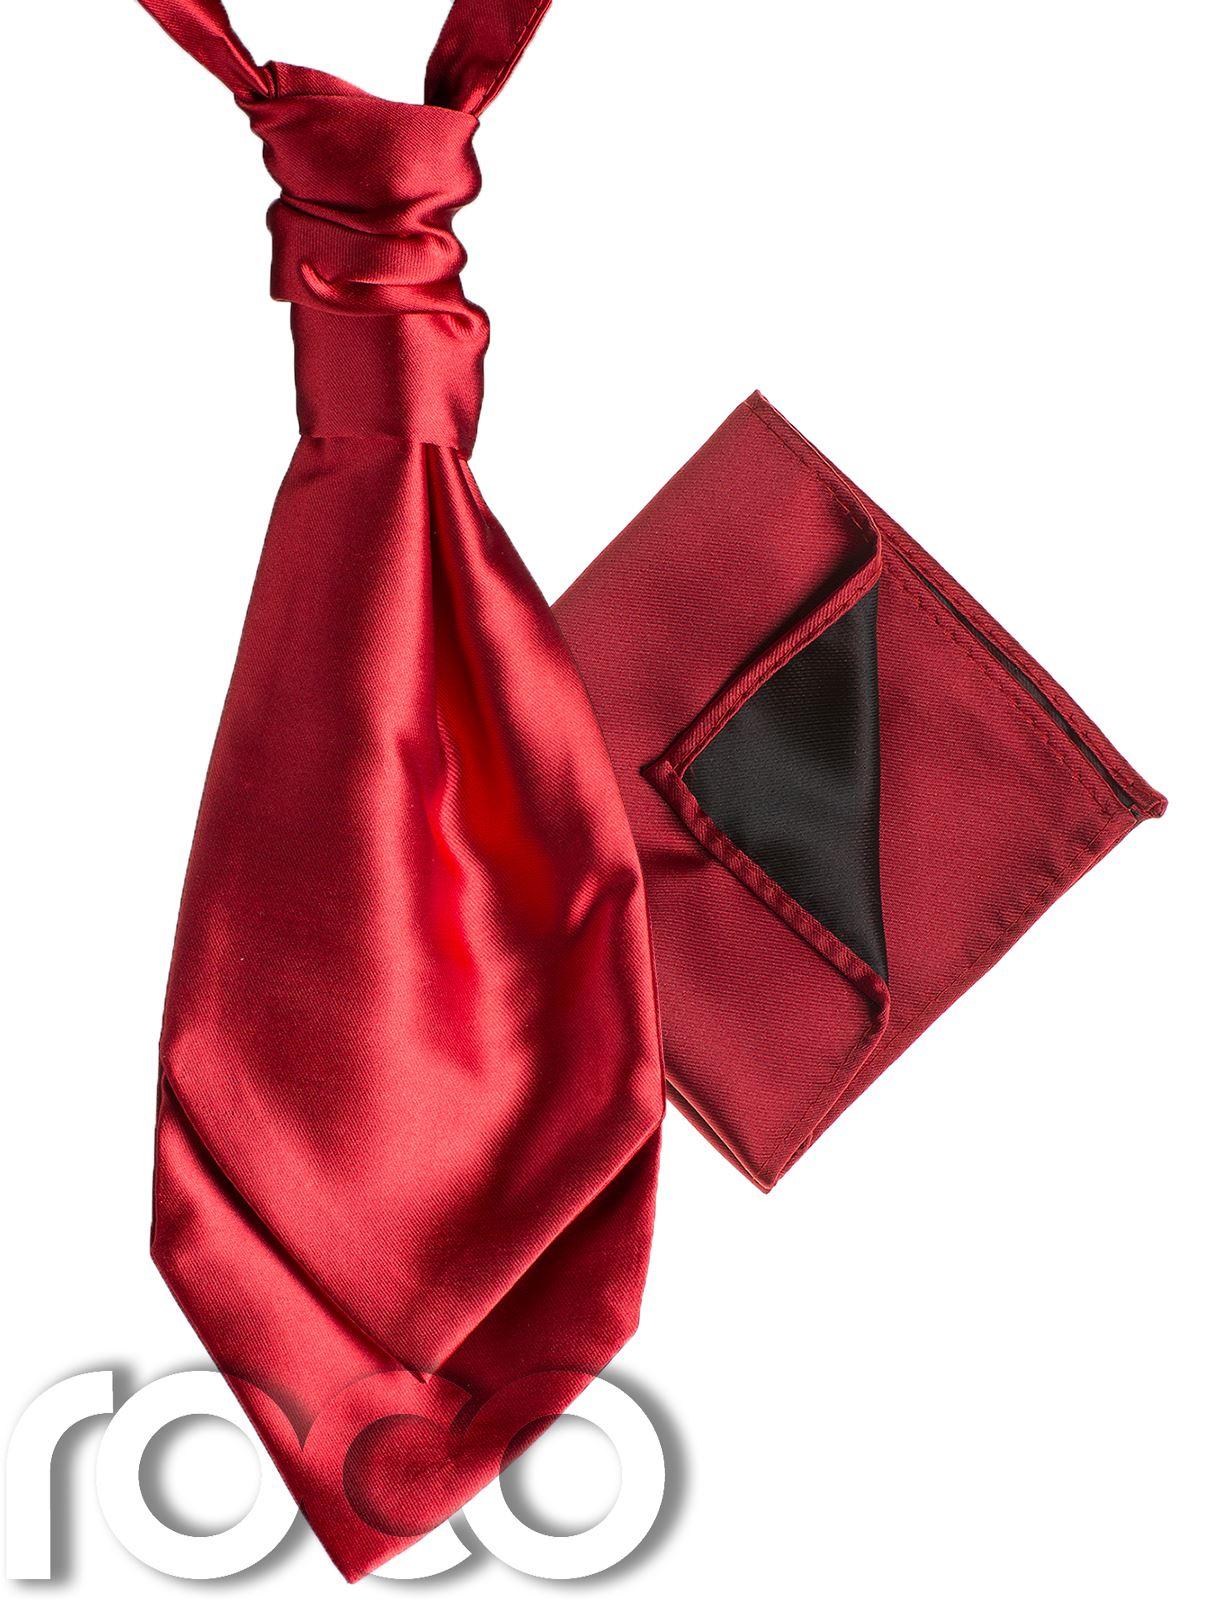 Mens-Satin-Wedding-Ruche-Cravat-Tie-with-hankys-Cravat-for-mens-mens-Cravats thumbnail 10